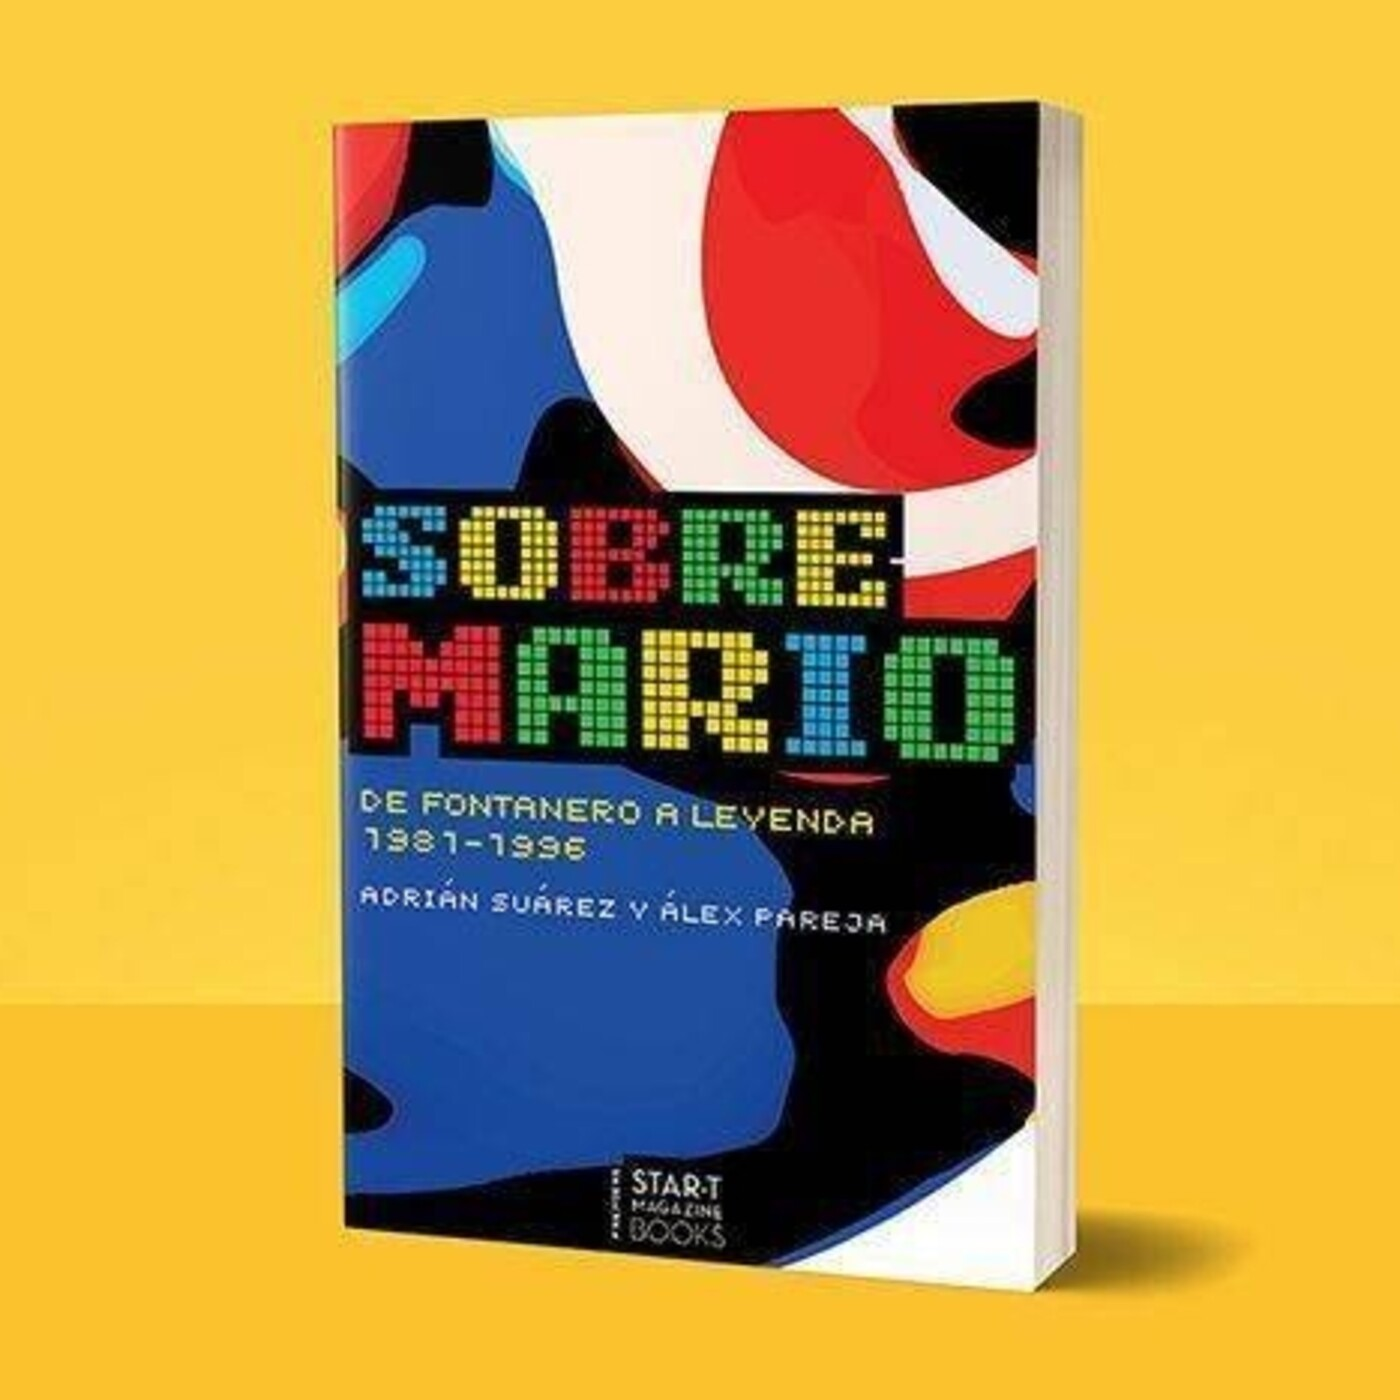 4x03 - ENTREVISTA CON ADRIÁN SUÁREZ (SOBRE MARIO: DE FONTANERO A LEYENDA) Y NINTENDO DIRECT MINI PARTNER SHOWCASE